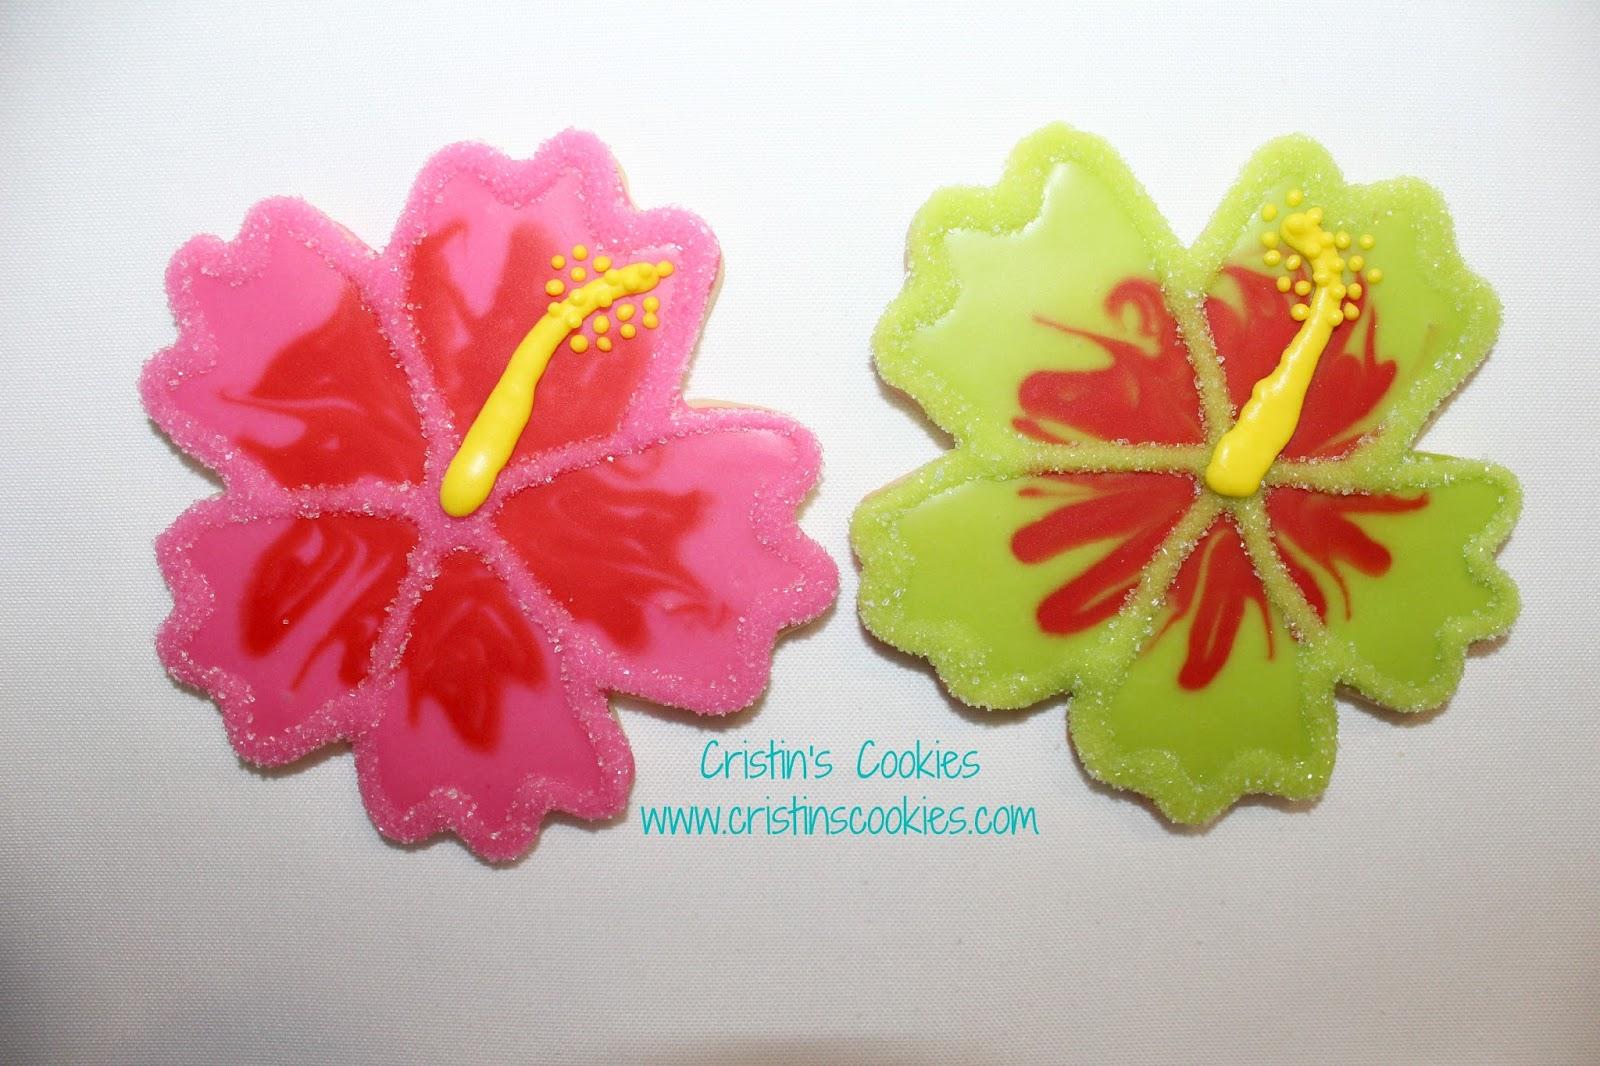 Cristins cookies hibiscus hula girls and free printable cookie cristins cookies hibiscus hula girls and free printable cookie tags too izmirmasajfo